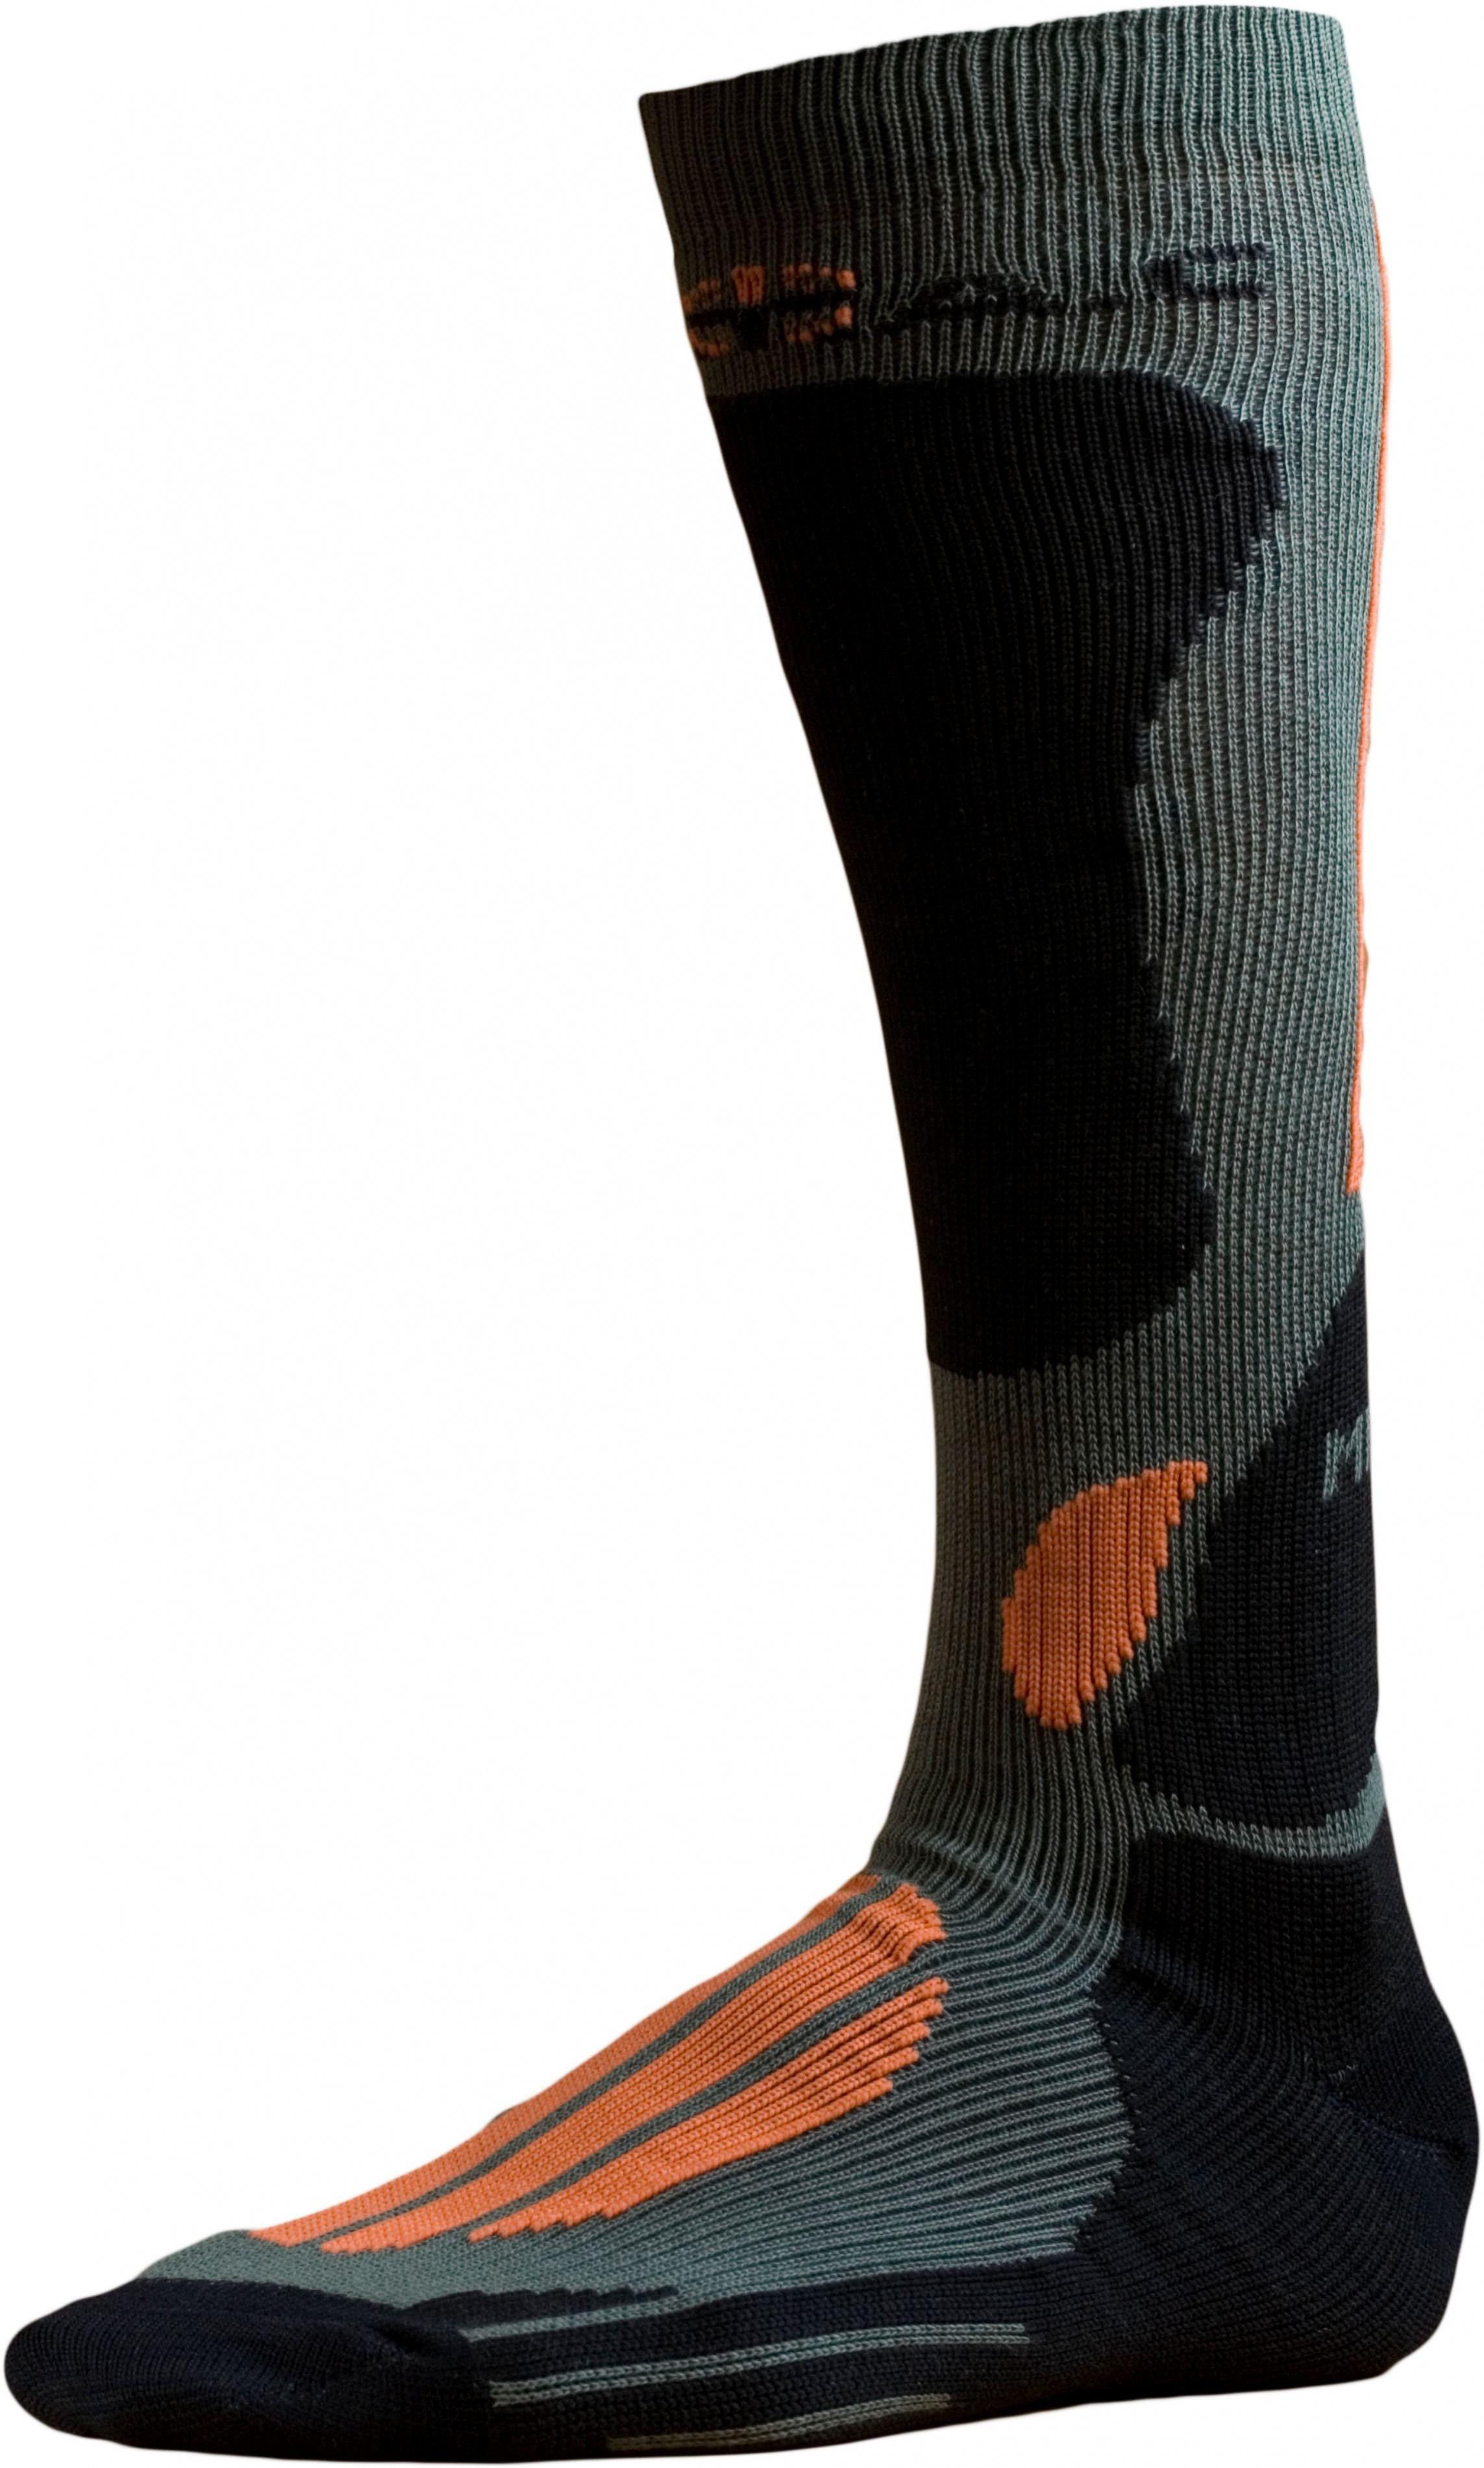 Ponožky BATAC Mission MI02 vel. 36-38 - olive/orange